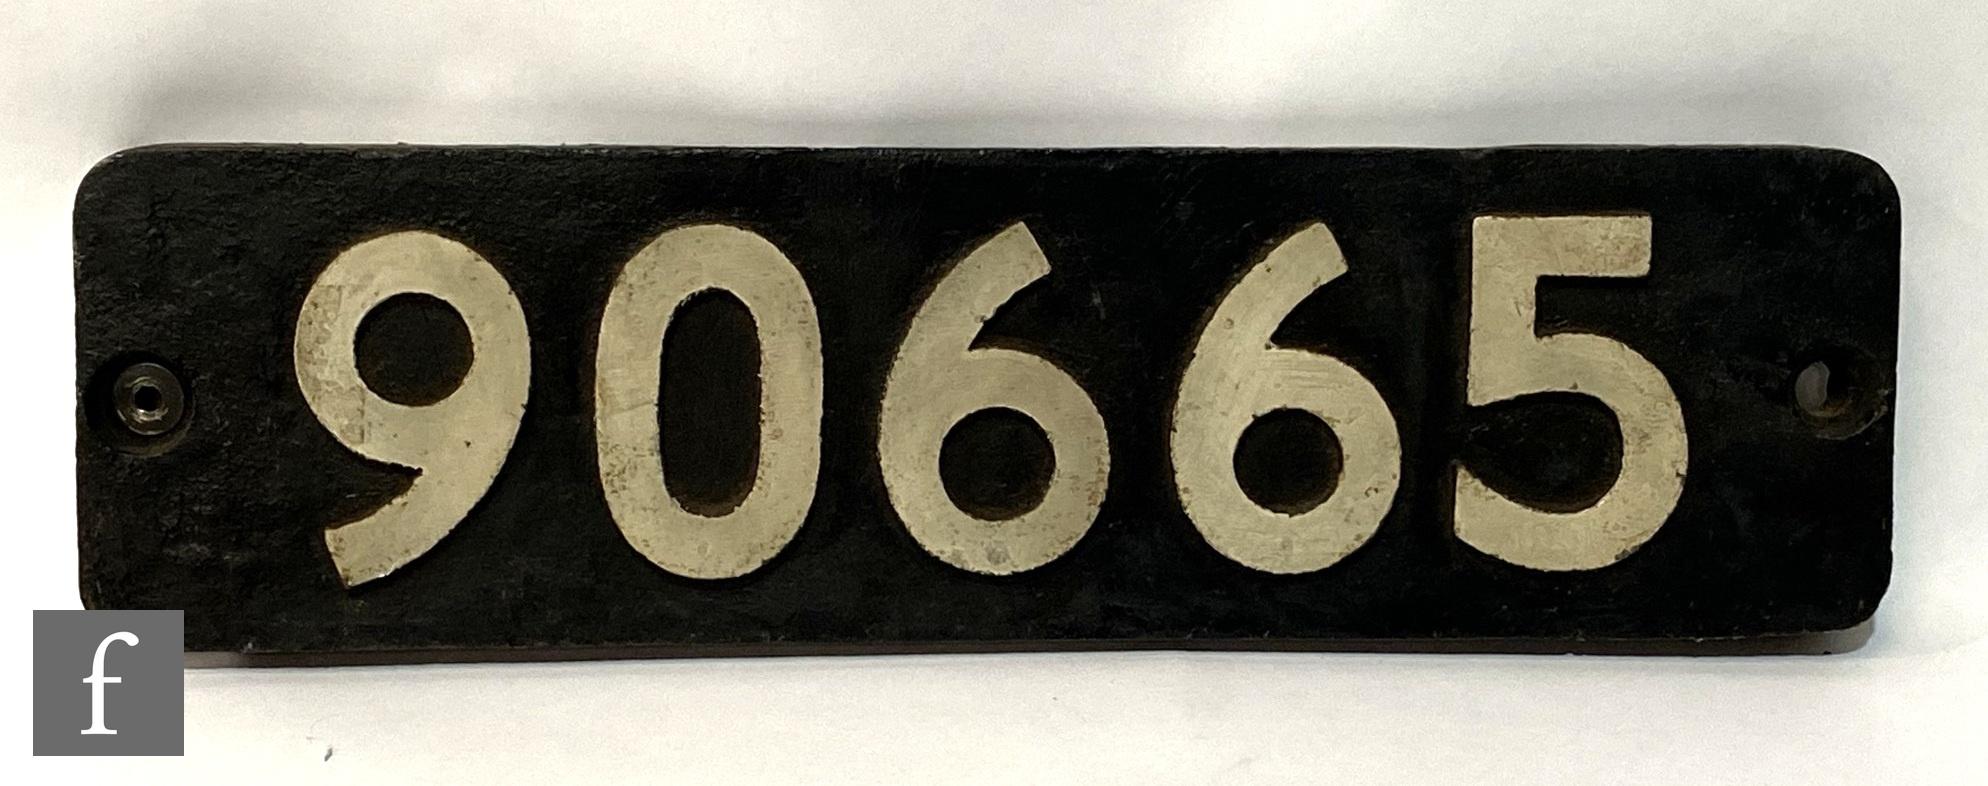 A cast iron locomotive smoke box No 90665, white lettering on a black background, 55cm x 15cm.